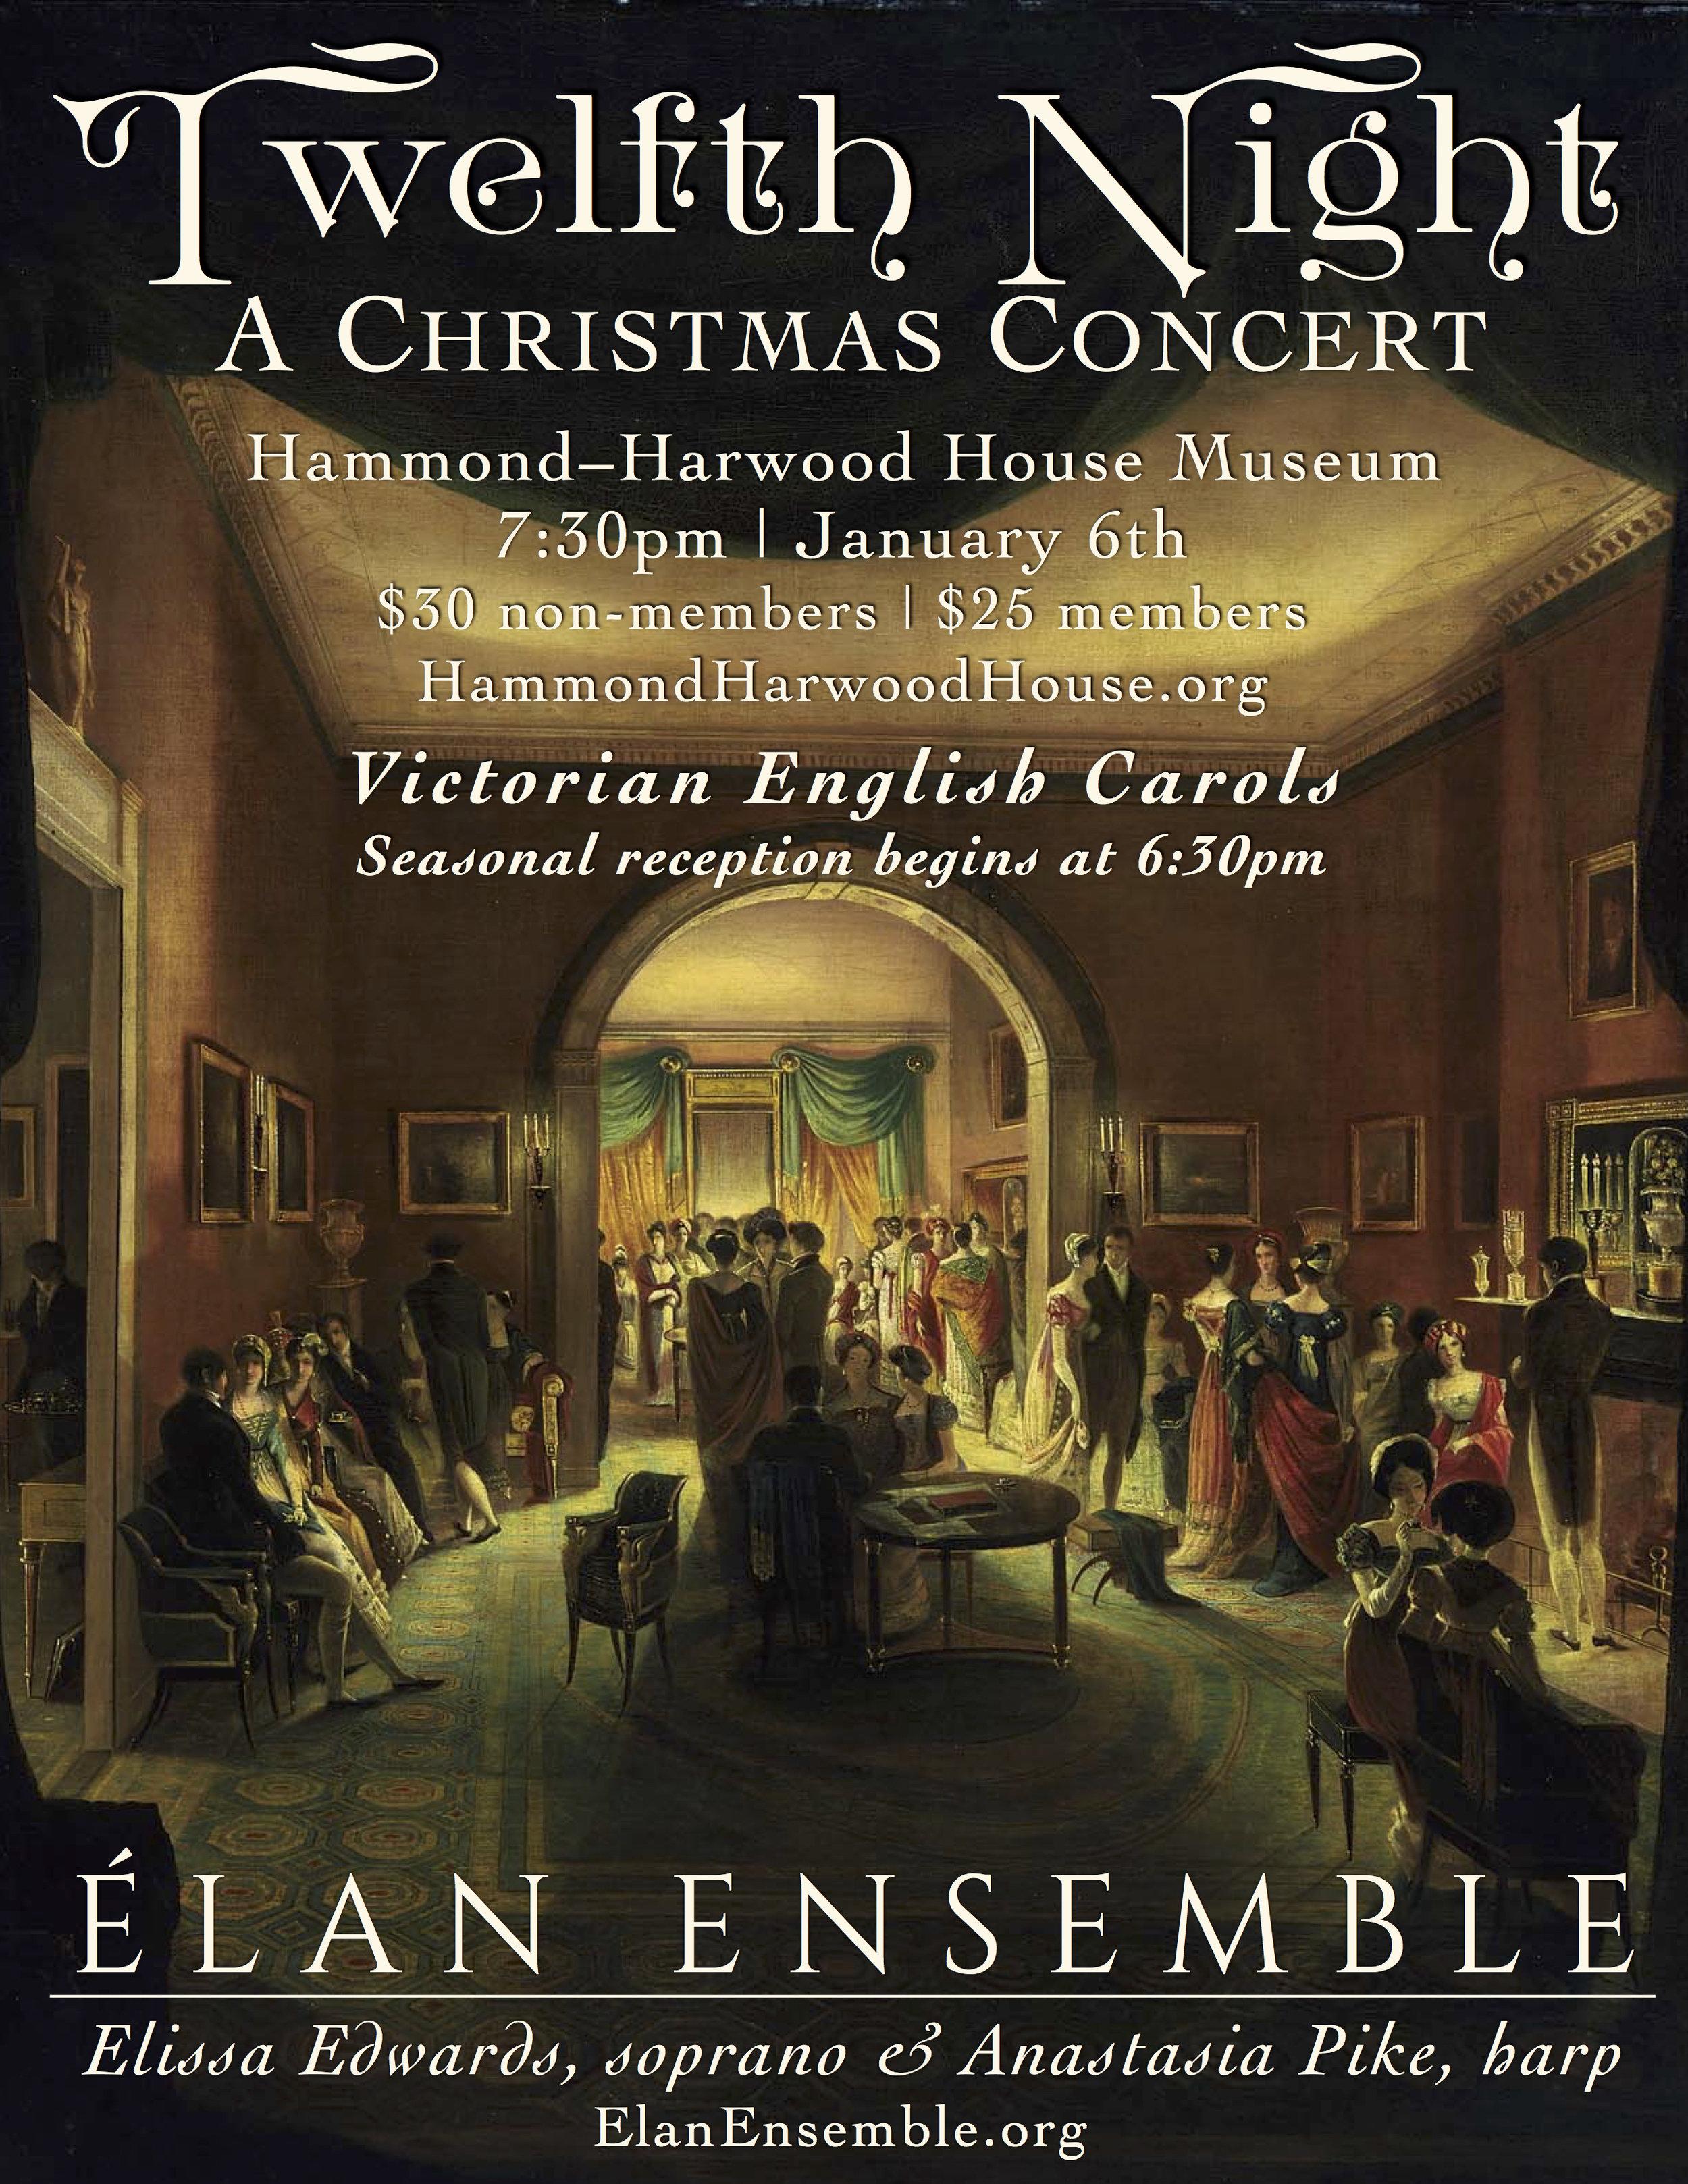 ELAN - twelfth night concert poster 2.jpg